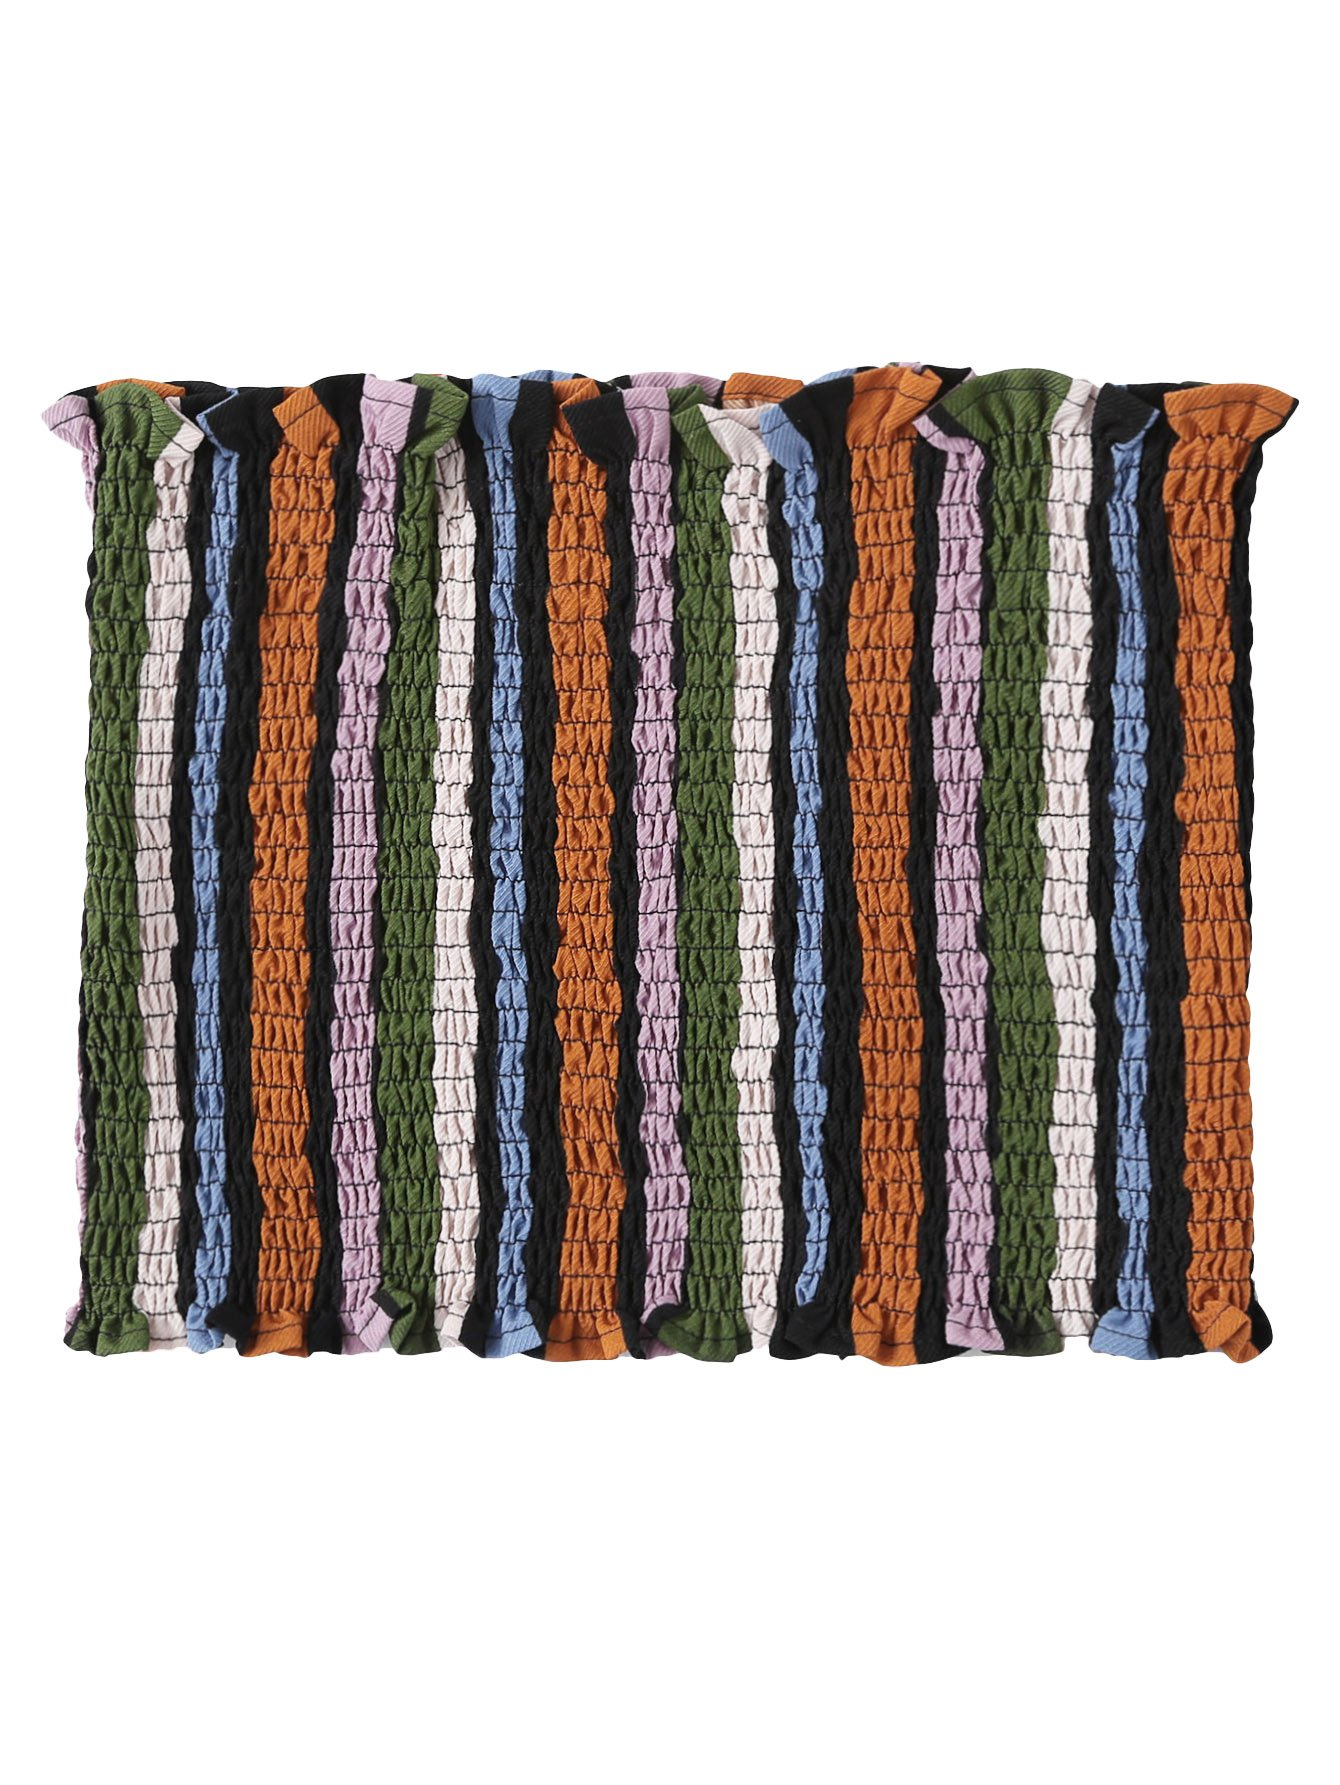 SweatyRocks Women's Strapless Bandeau Crop Tops Seamless Striped Frill Trim Tube Tops Striped#2 M